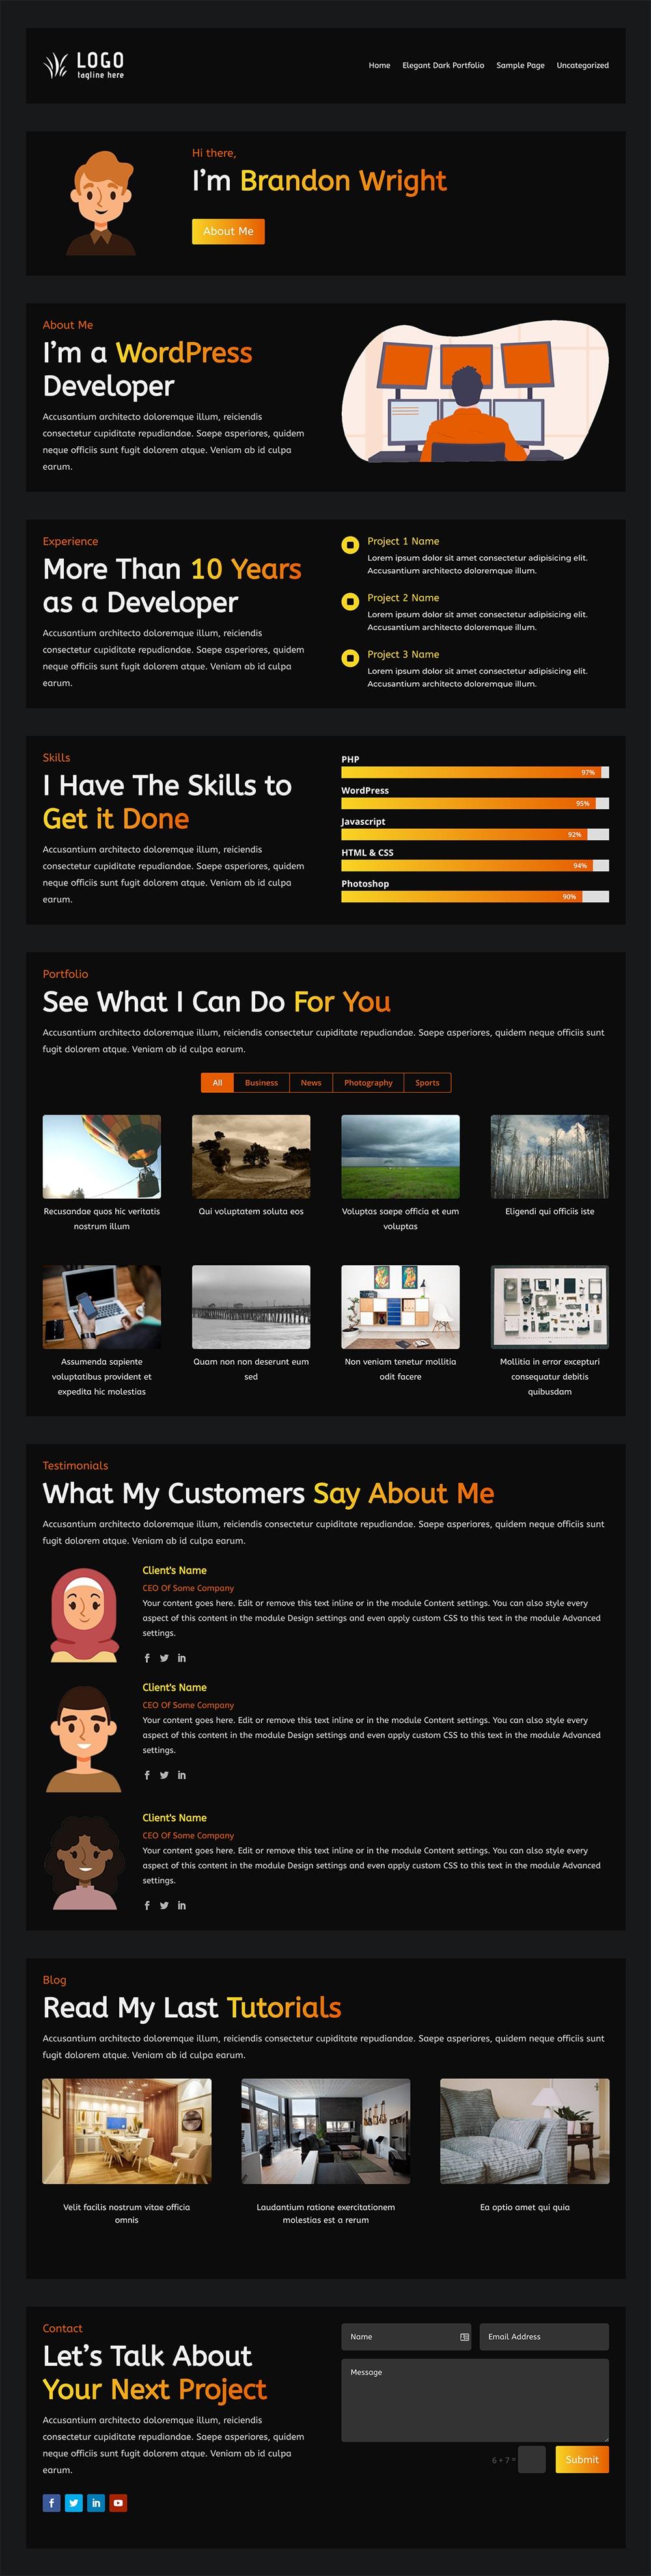 free divi layout, portfolio layout